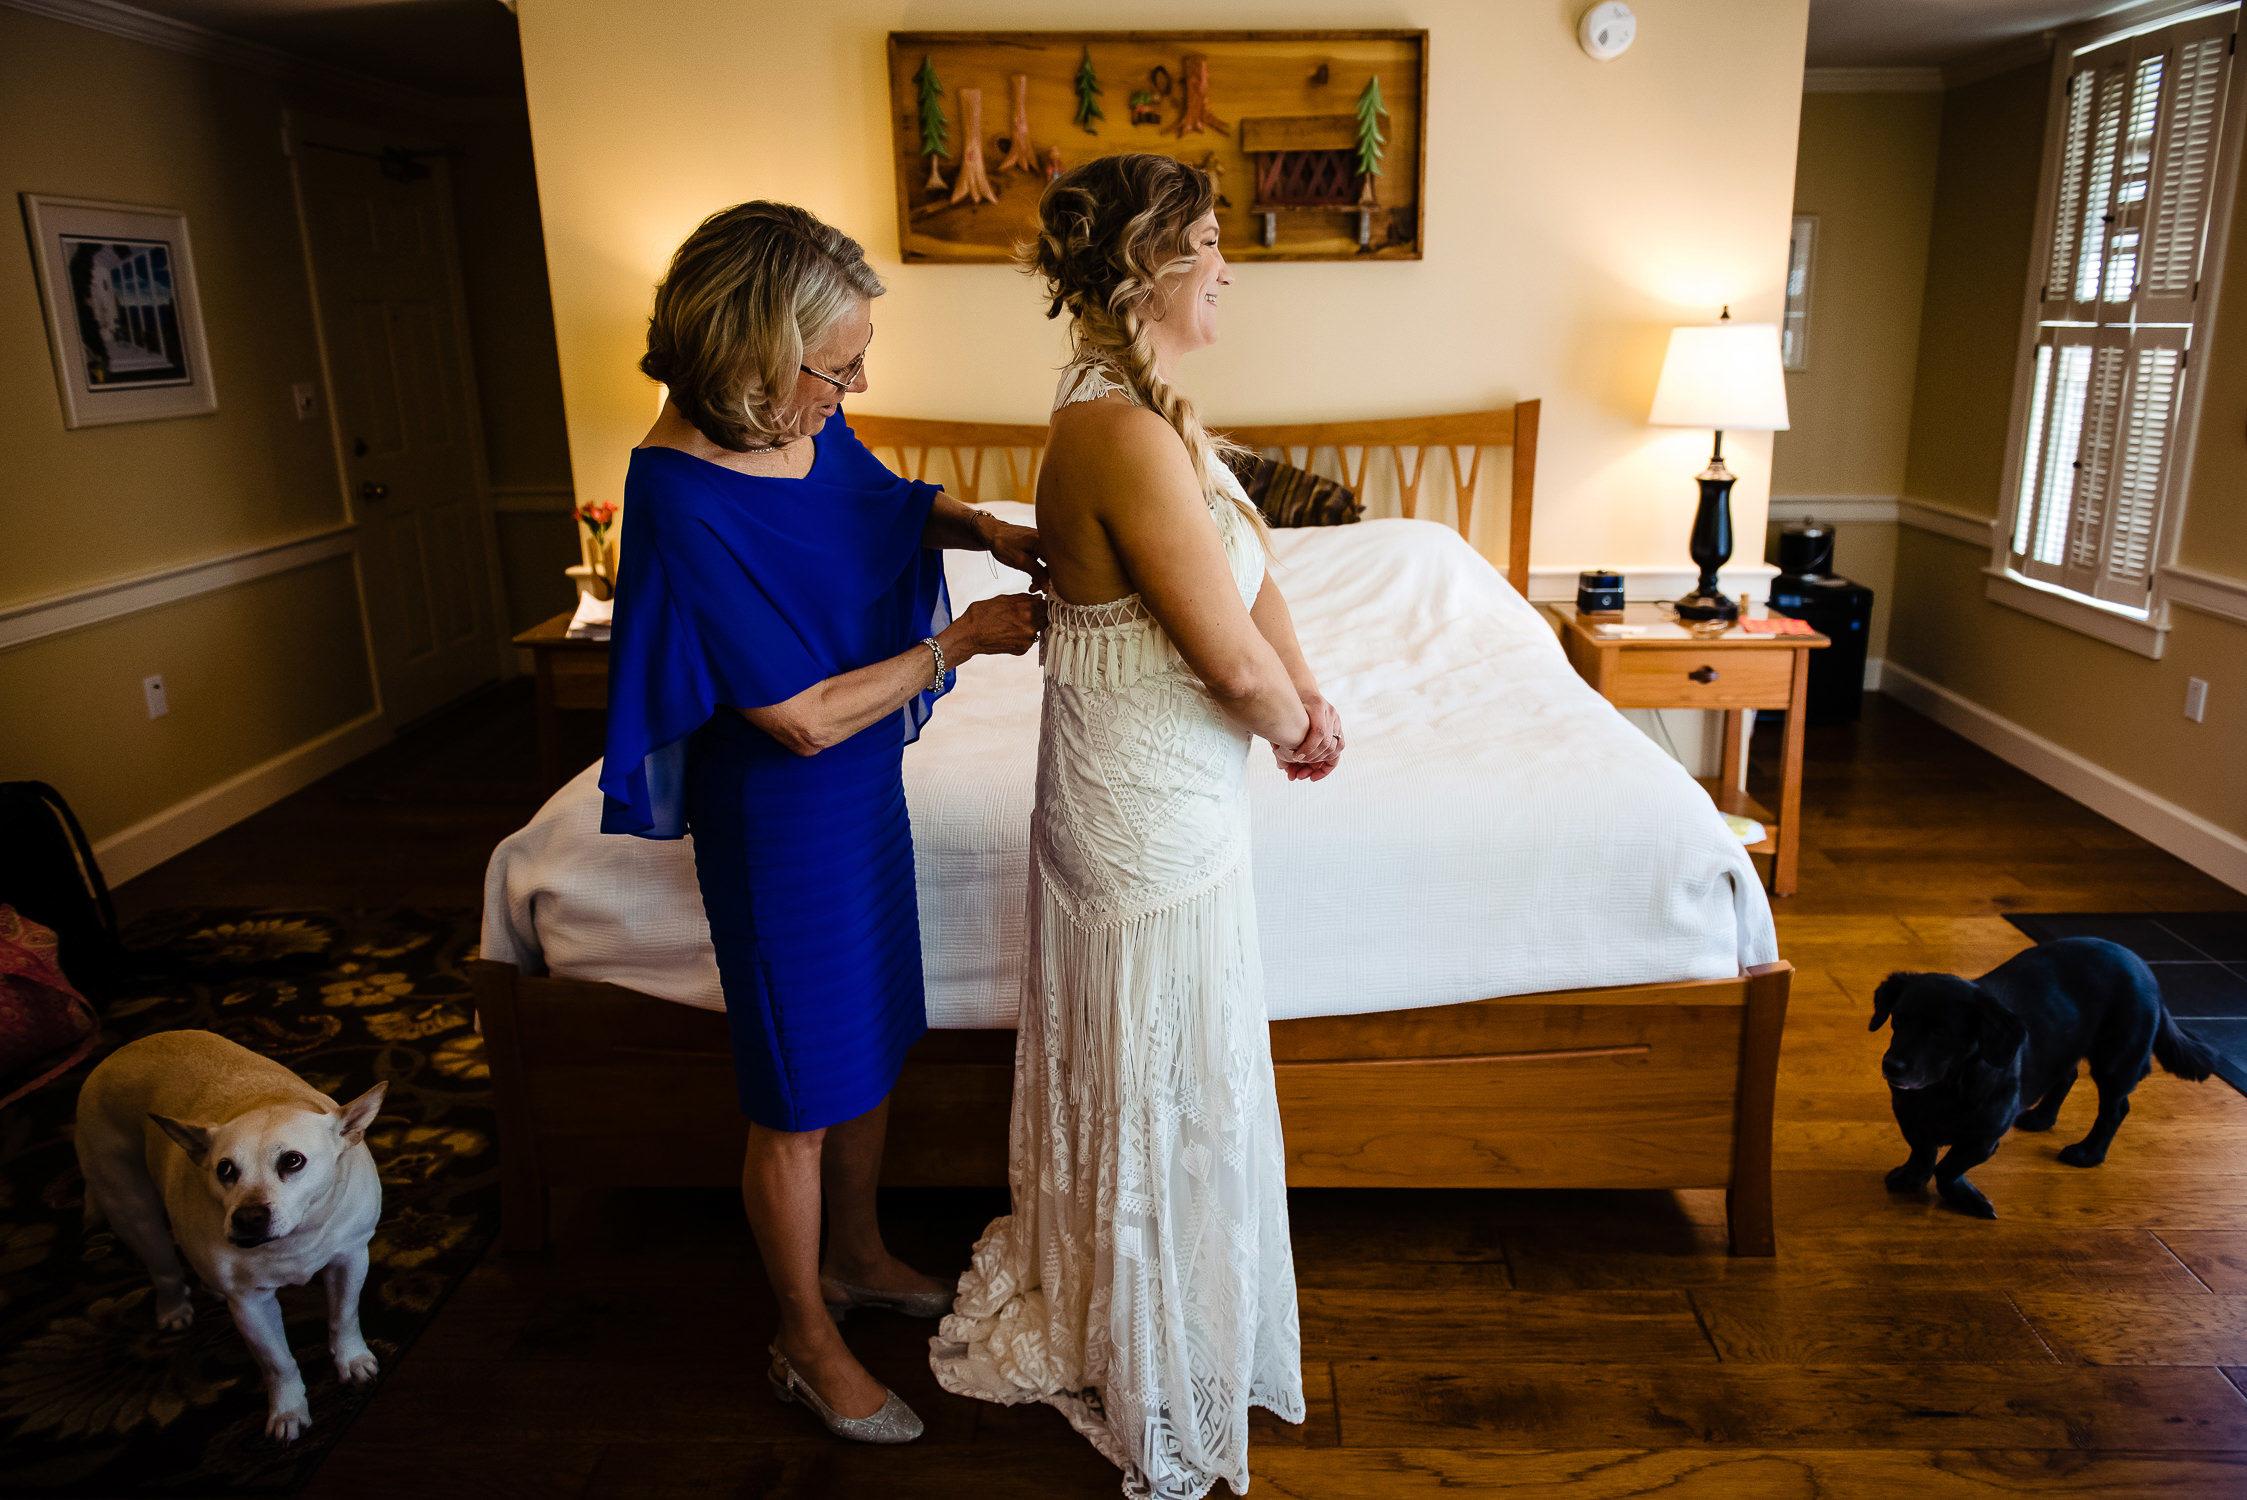 tourterelle-vermont-wedding-photographers-005-2-2247x1500.jpg